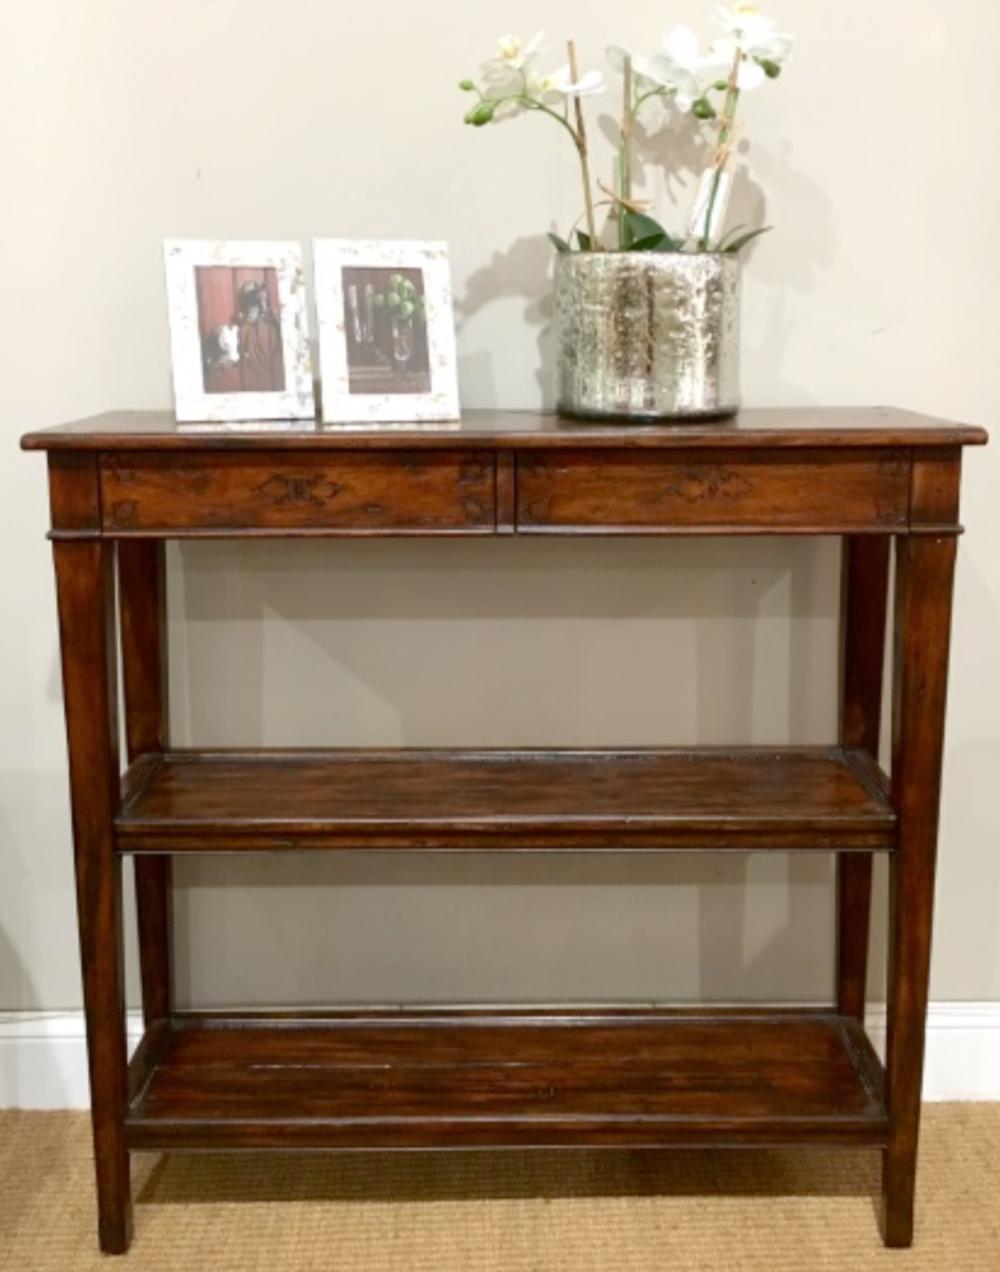 Antique Wood Console $795